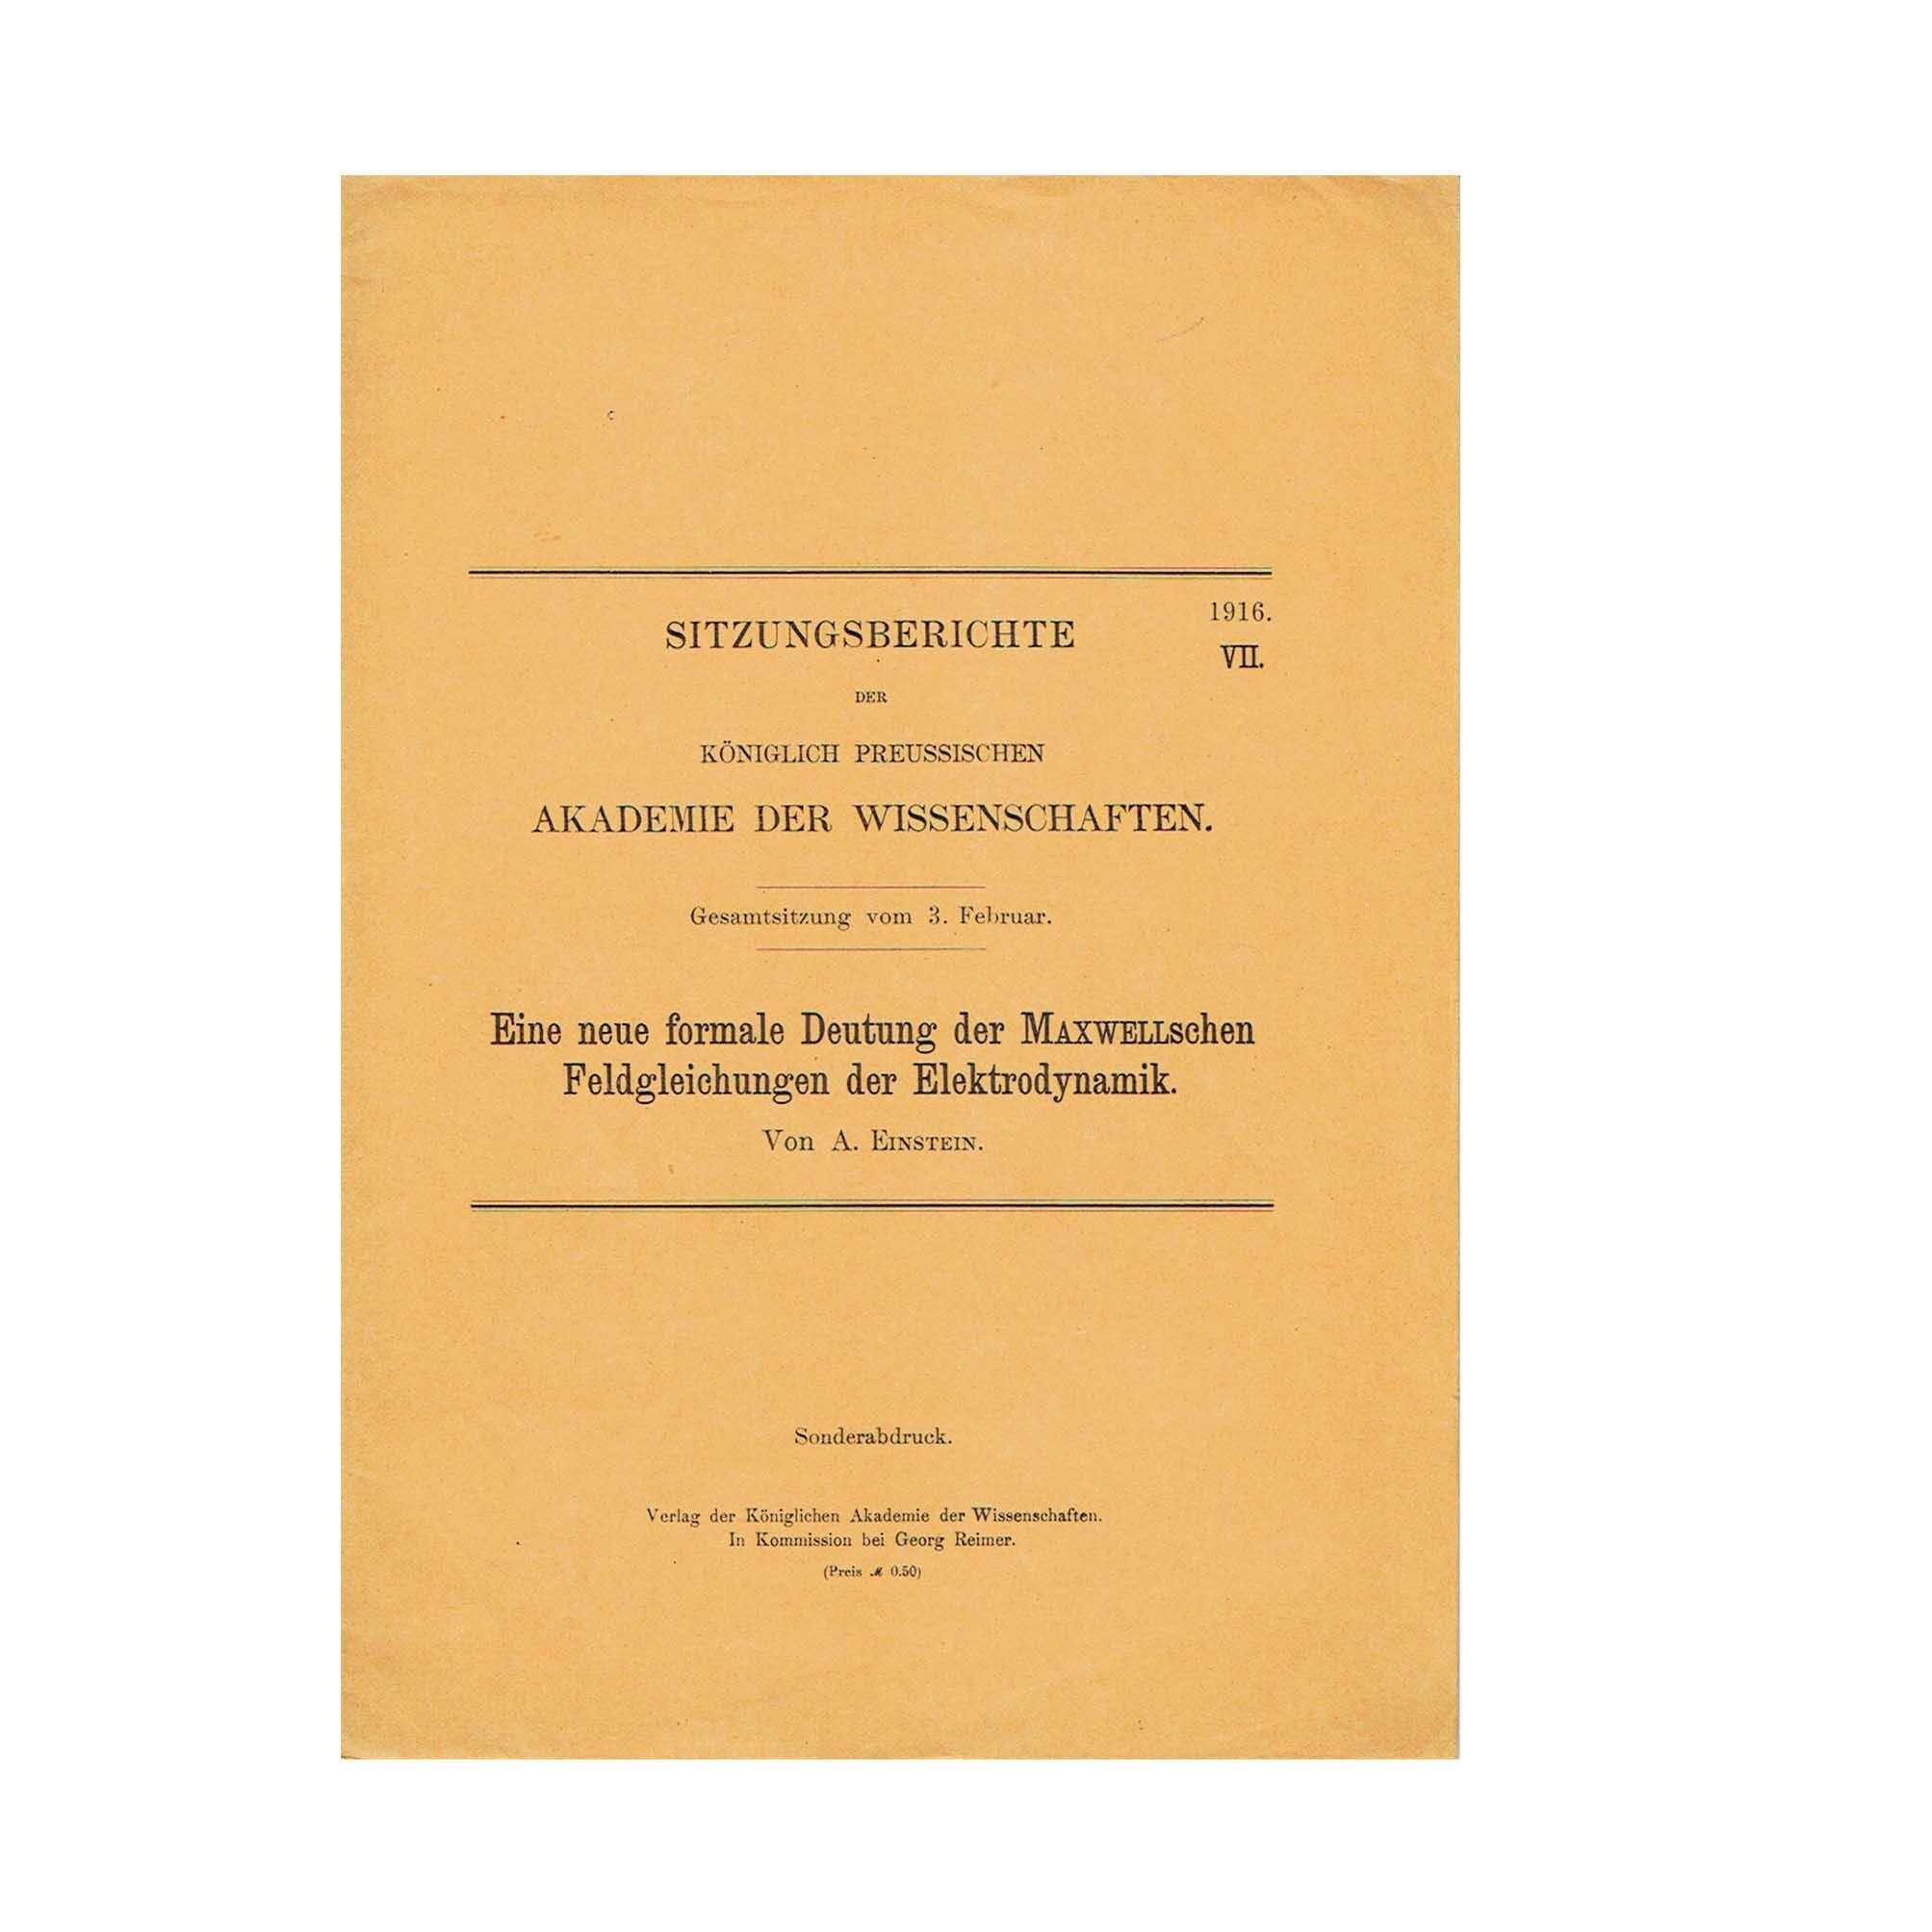 5713 Einstein Maxwell Akademie VII 1916 free SA Cover recto N